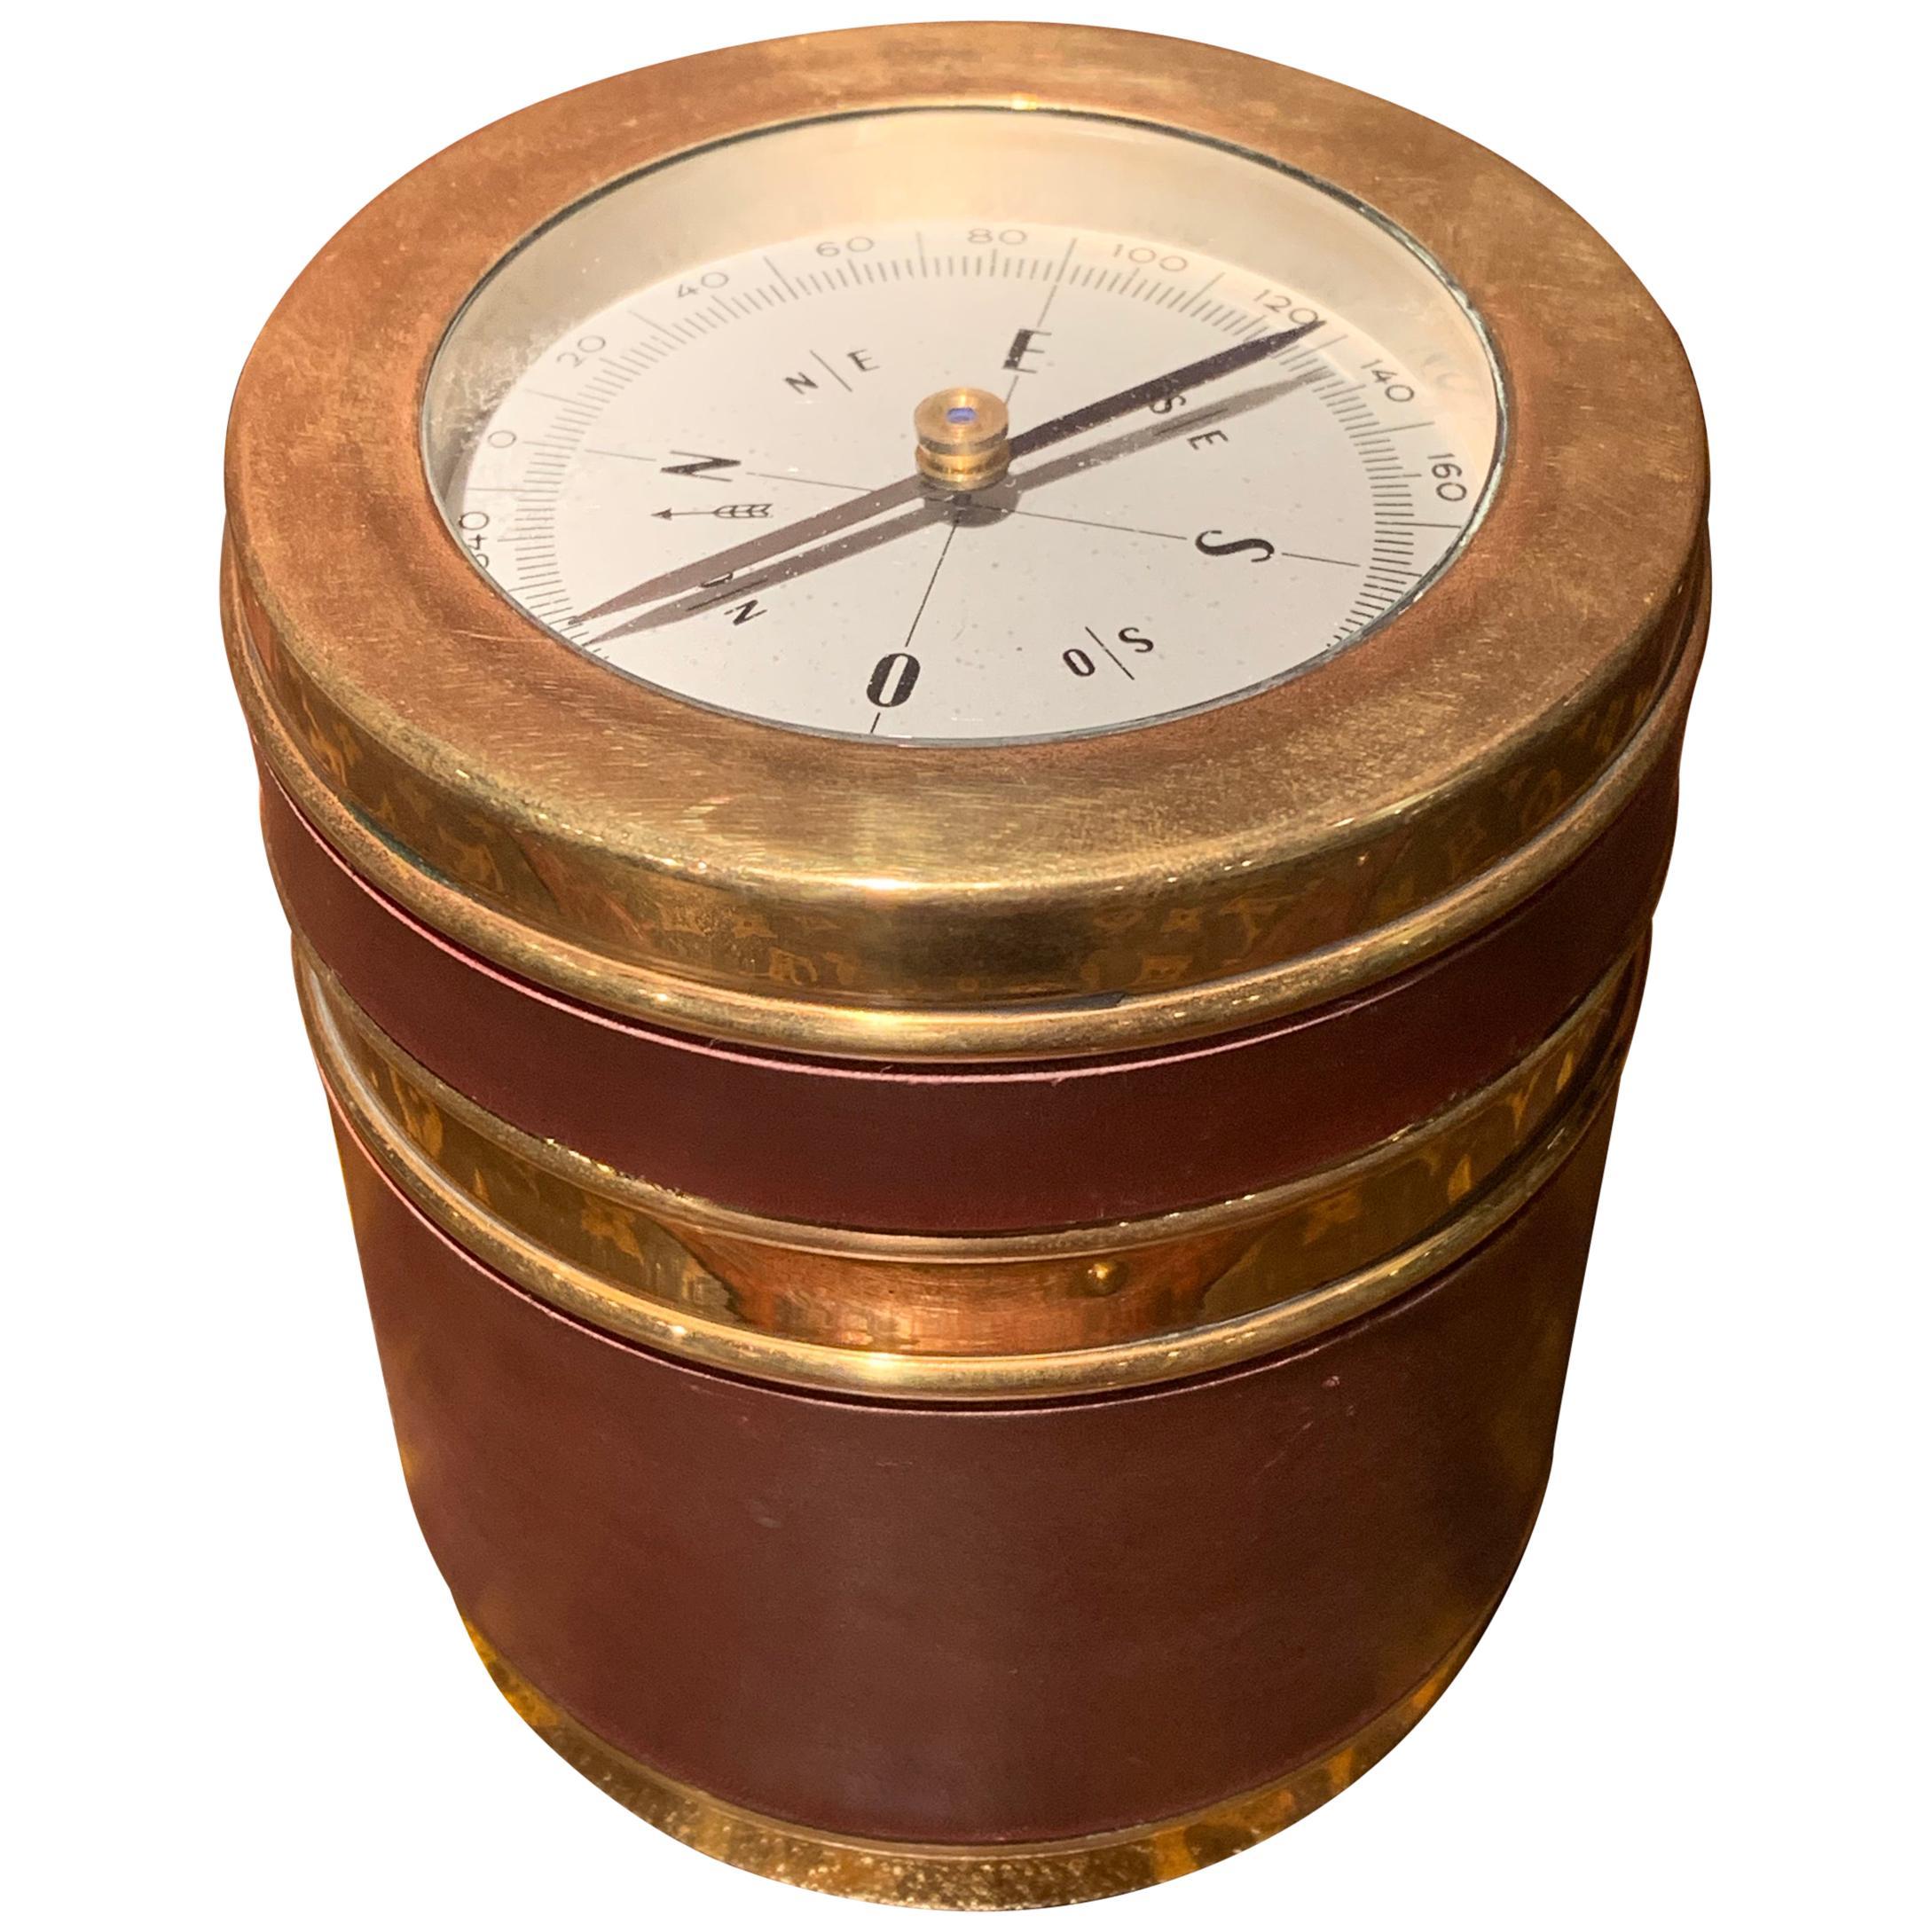 1960s Hermès Compass Cigarette Box